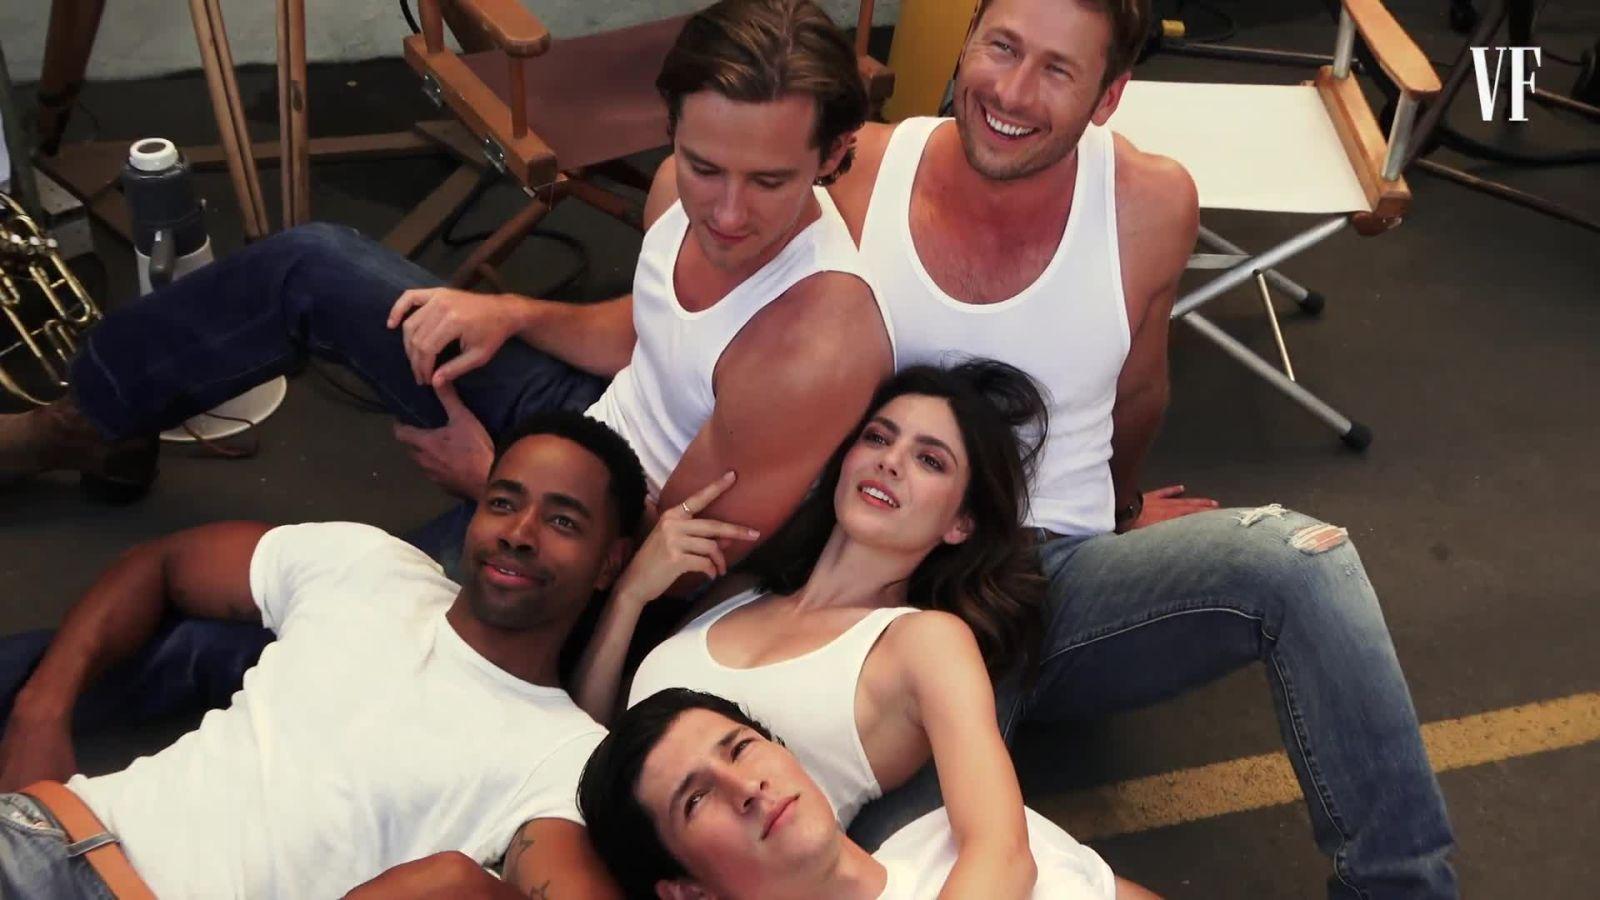 Behind the Scenes of 'Top Gun: Maverick'